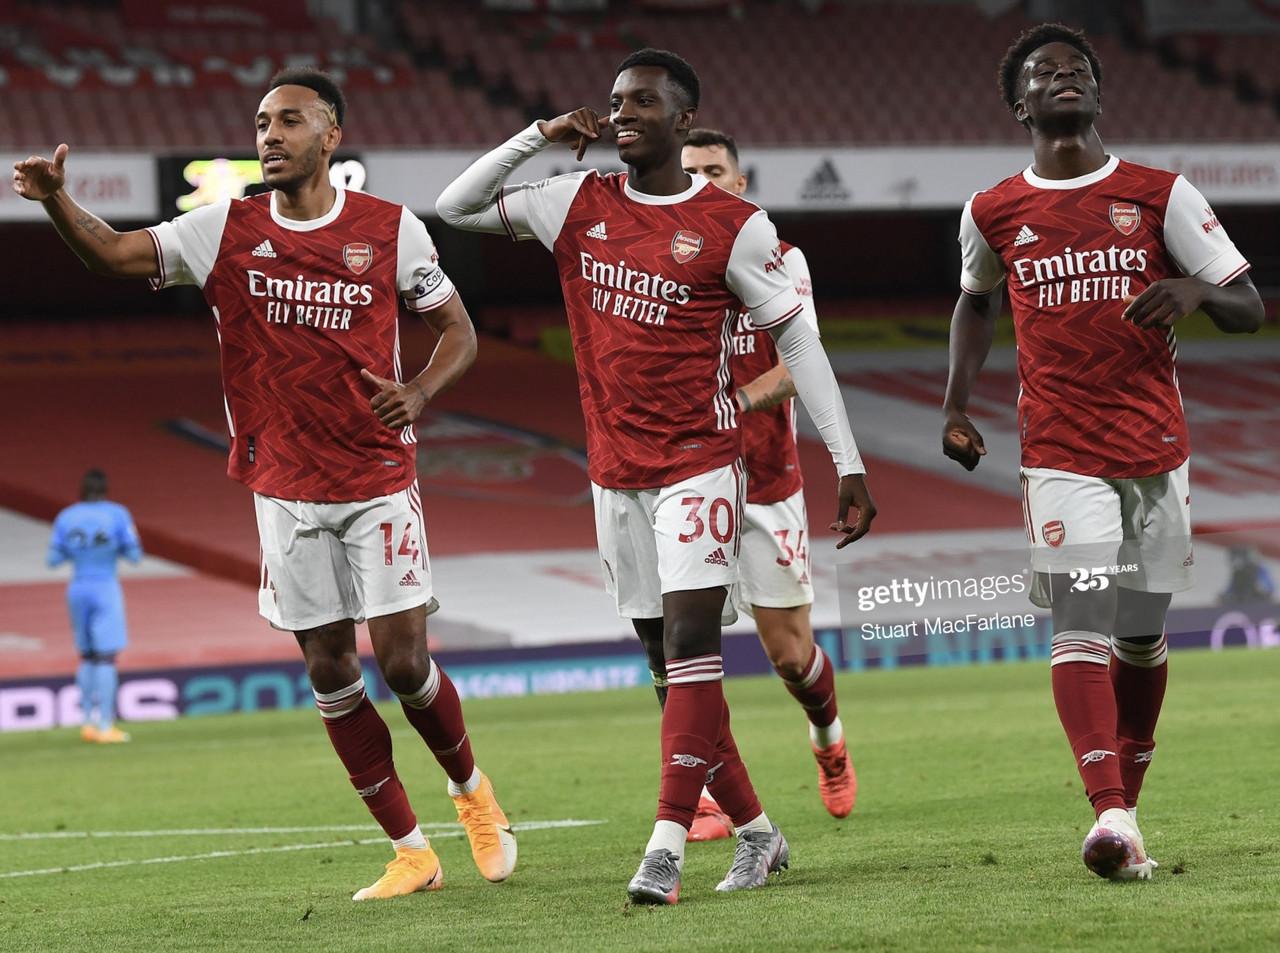 Arsenal vs West Ham: Player Ratings